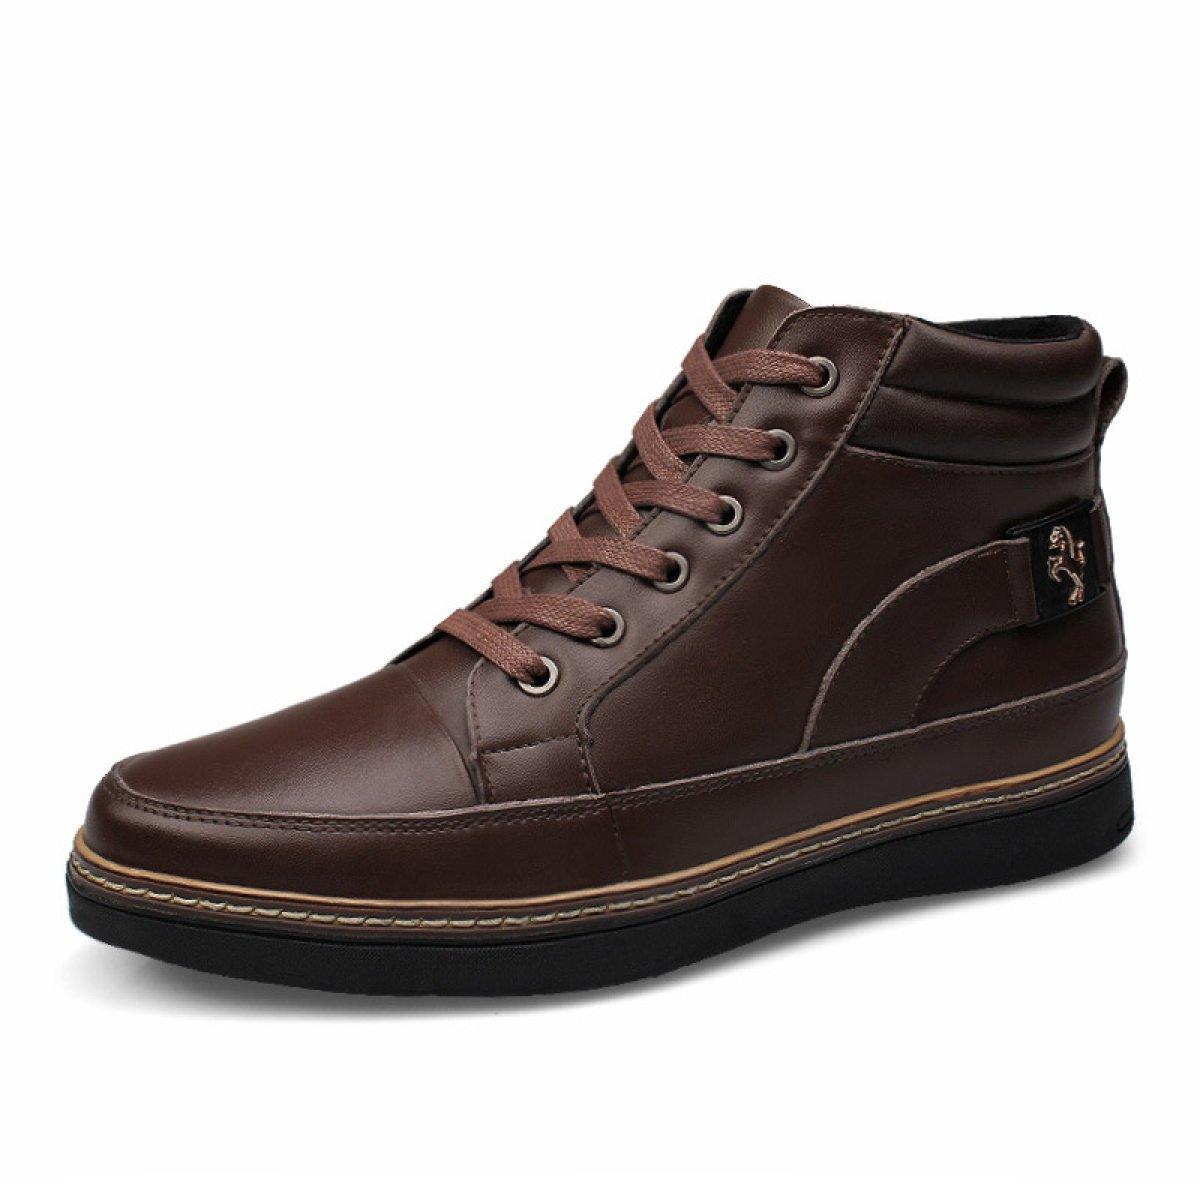 Herbst Und Winter Männer England Herrenschuhe Der Herrenschuhe Freizeitschuhe Schuhe In Der Herrenschuhe Hilfe SingleschuheBraun eecac4